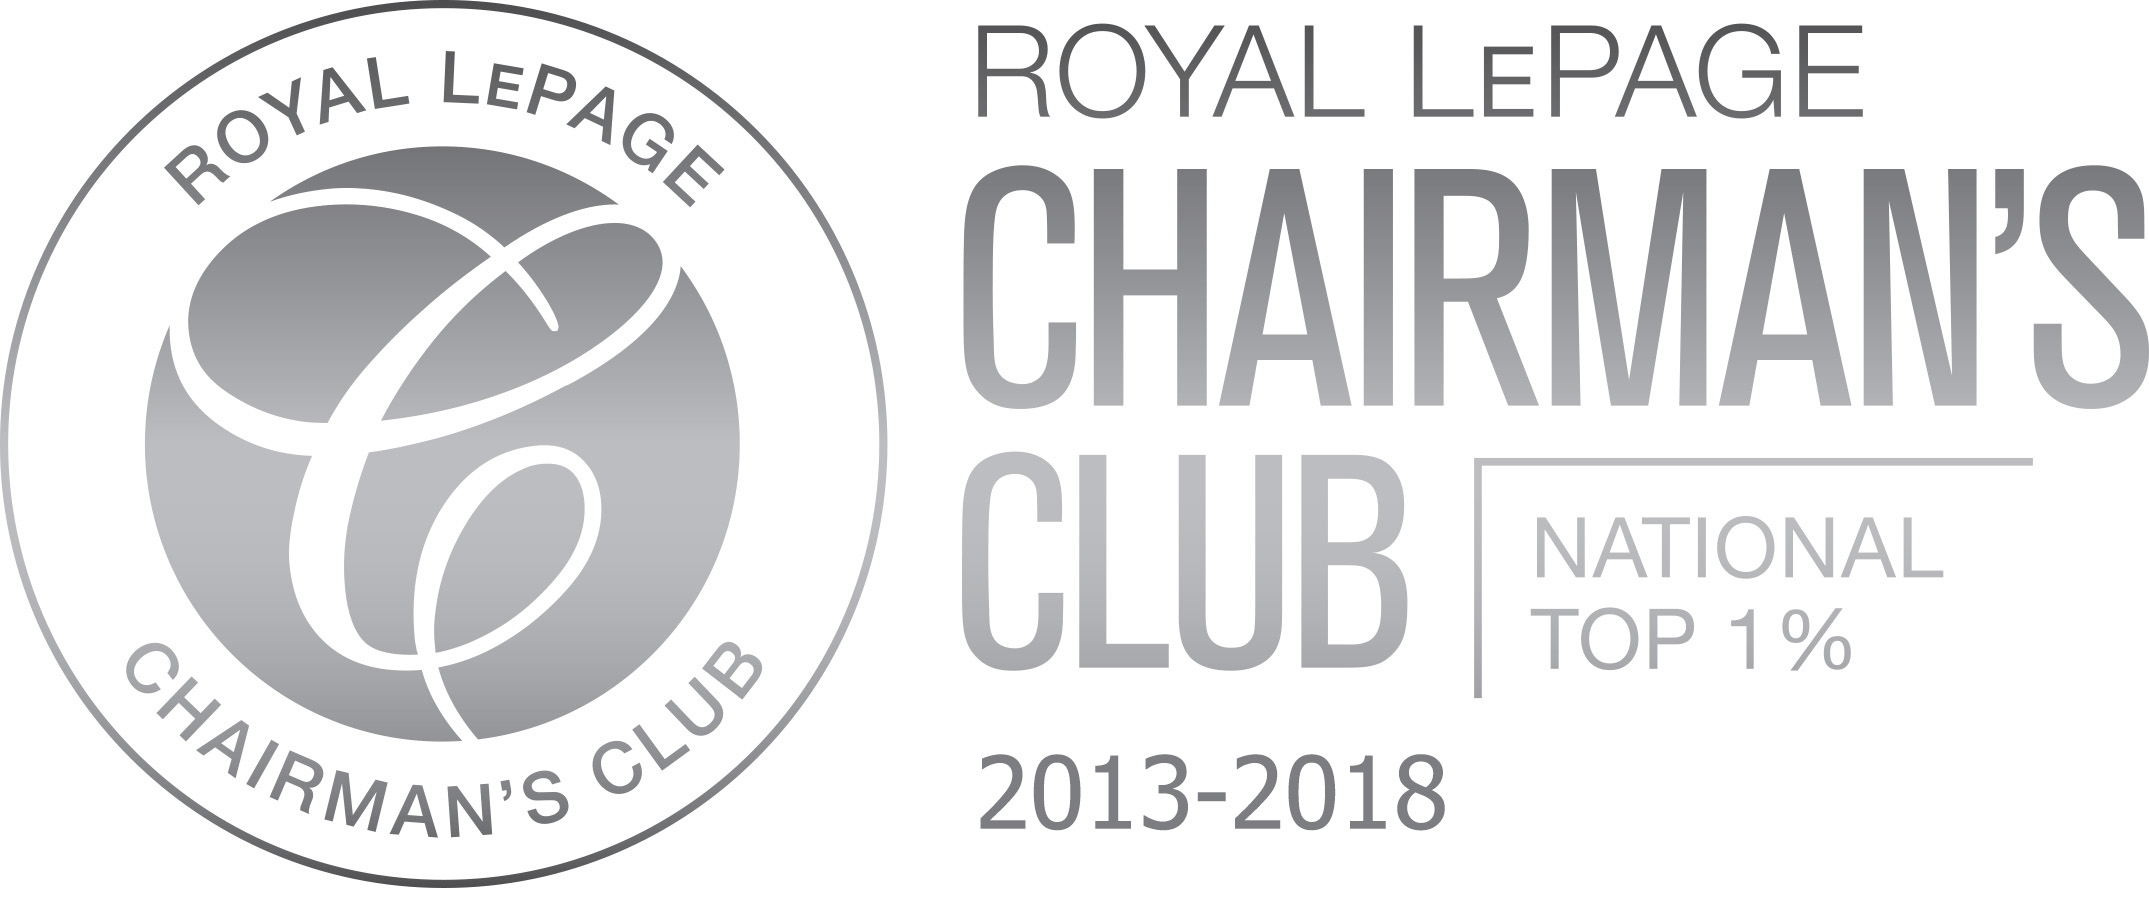 RLP-Chairmans-MULTI-EN-CMYK.jpg